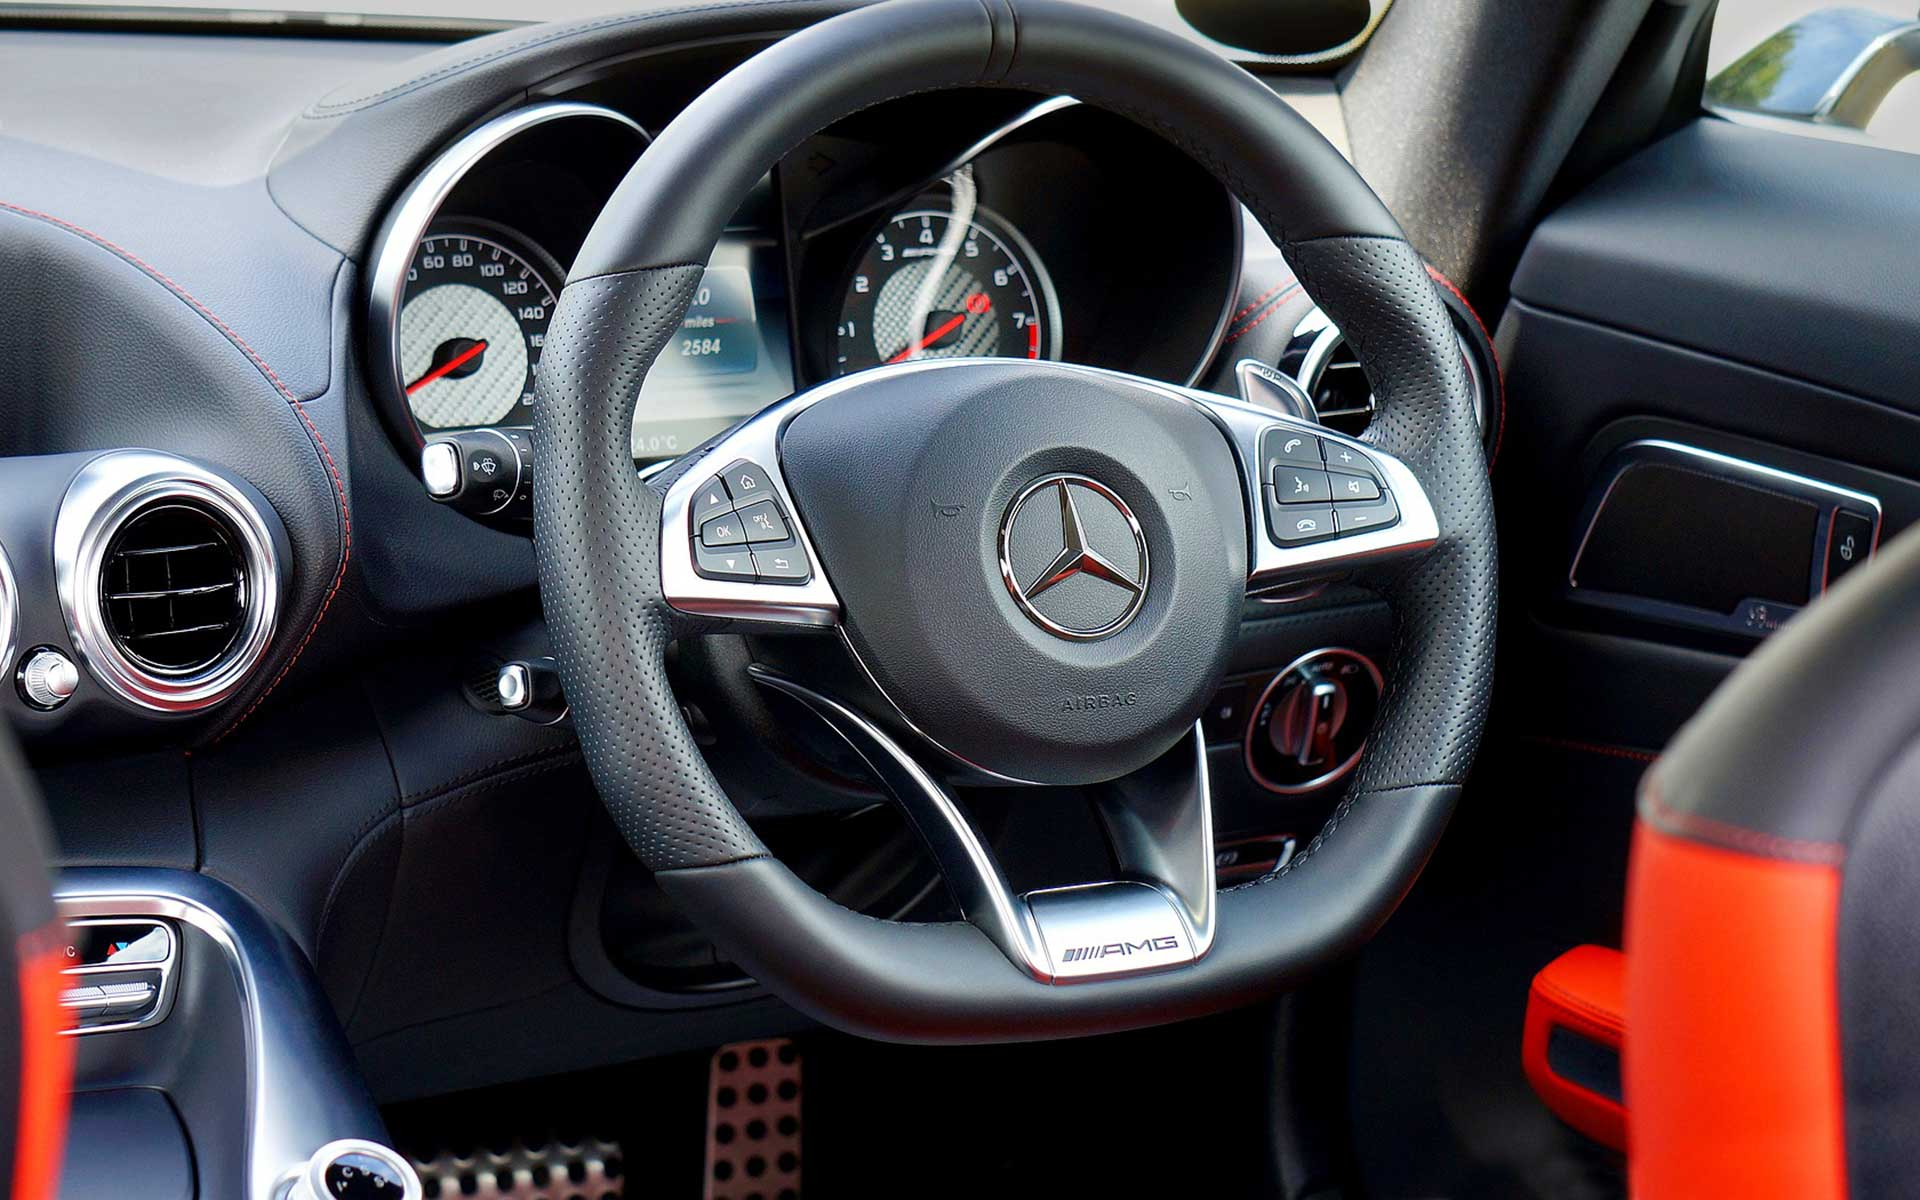 Merceds Benz Cockpit AMG Achat Voitures Suisse